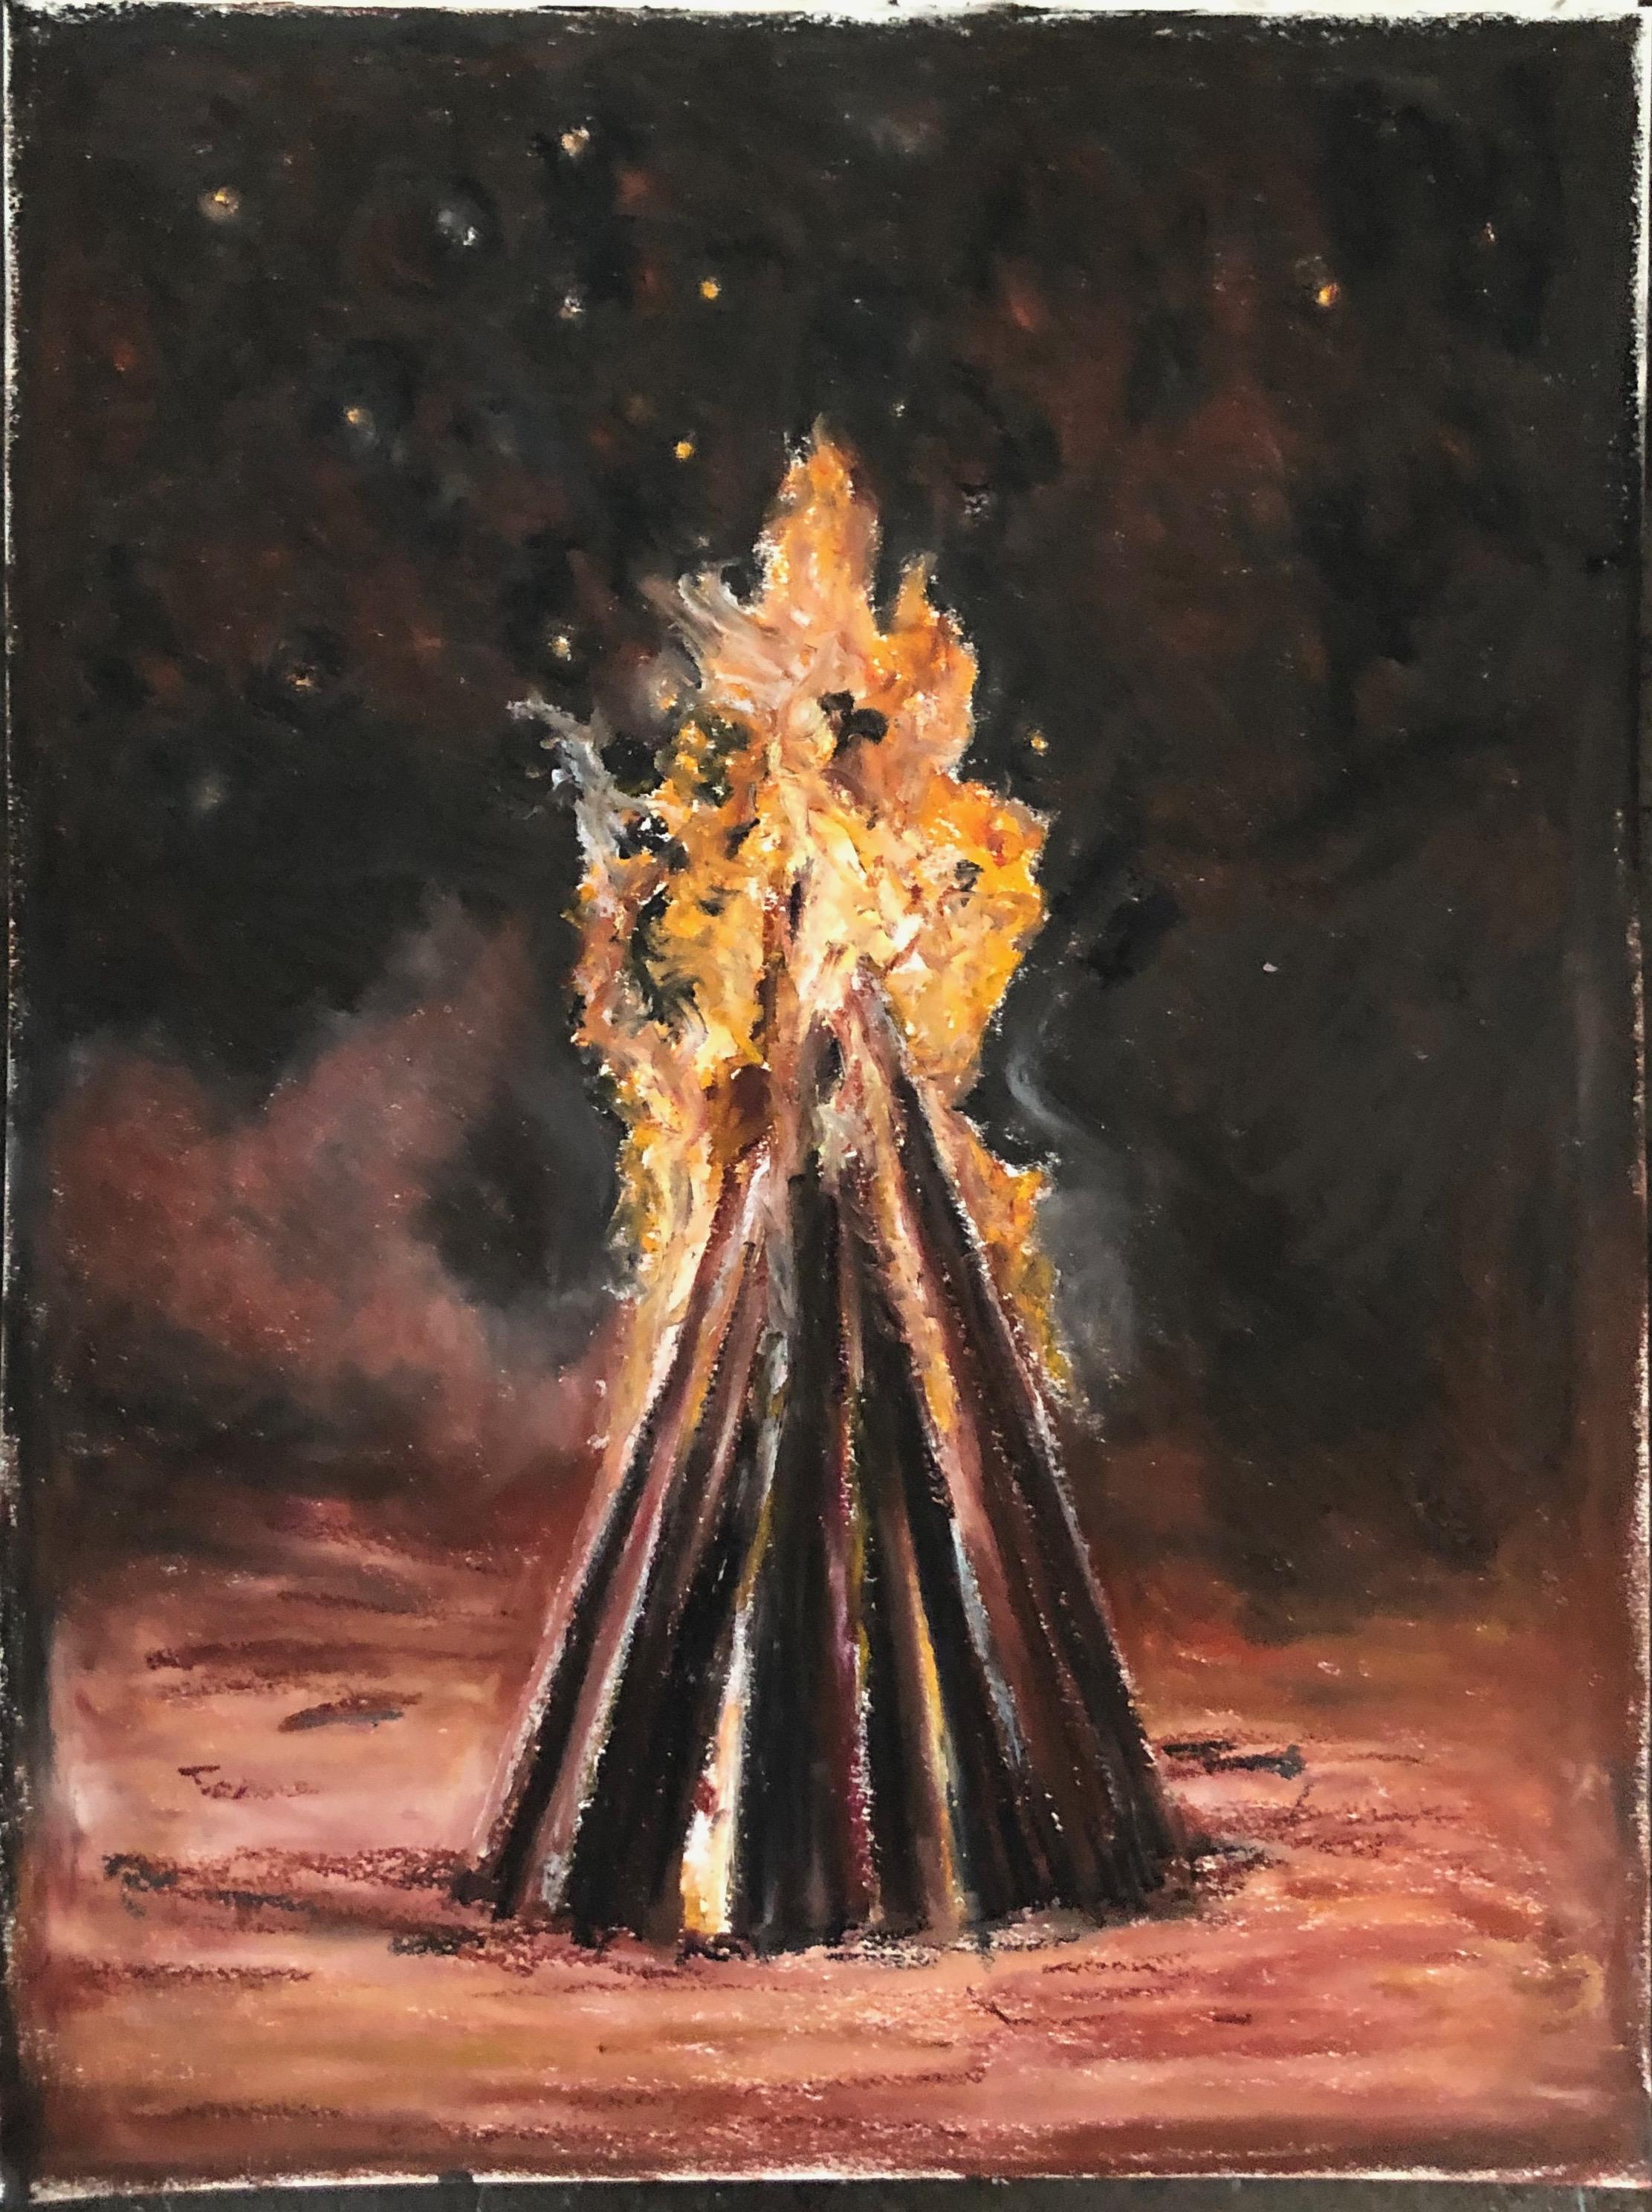 Levee Fire